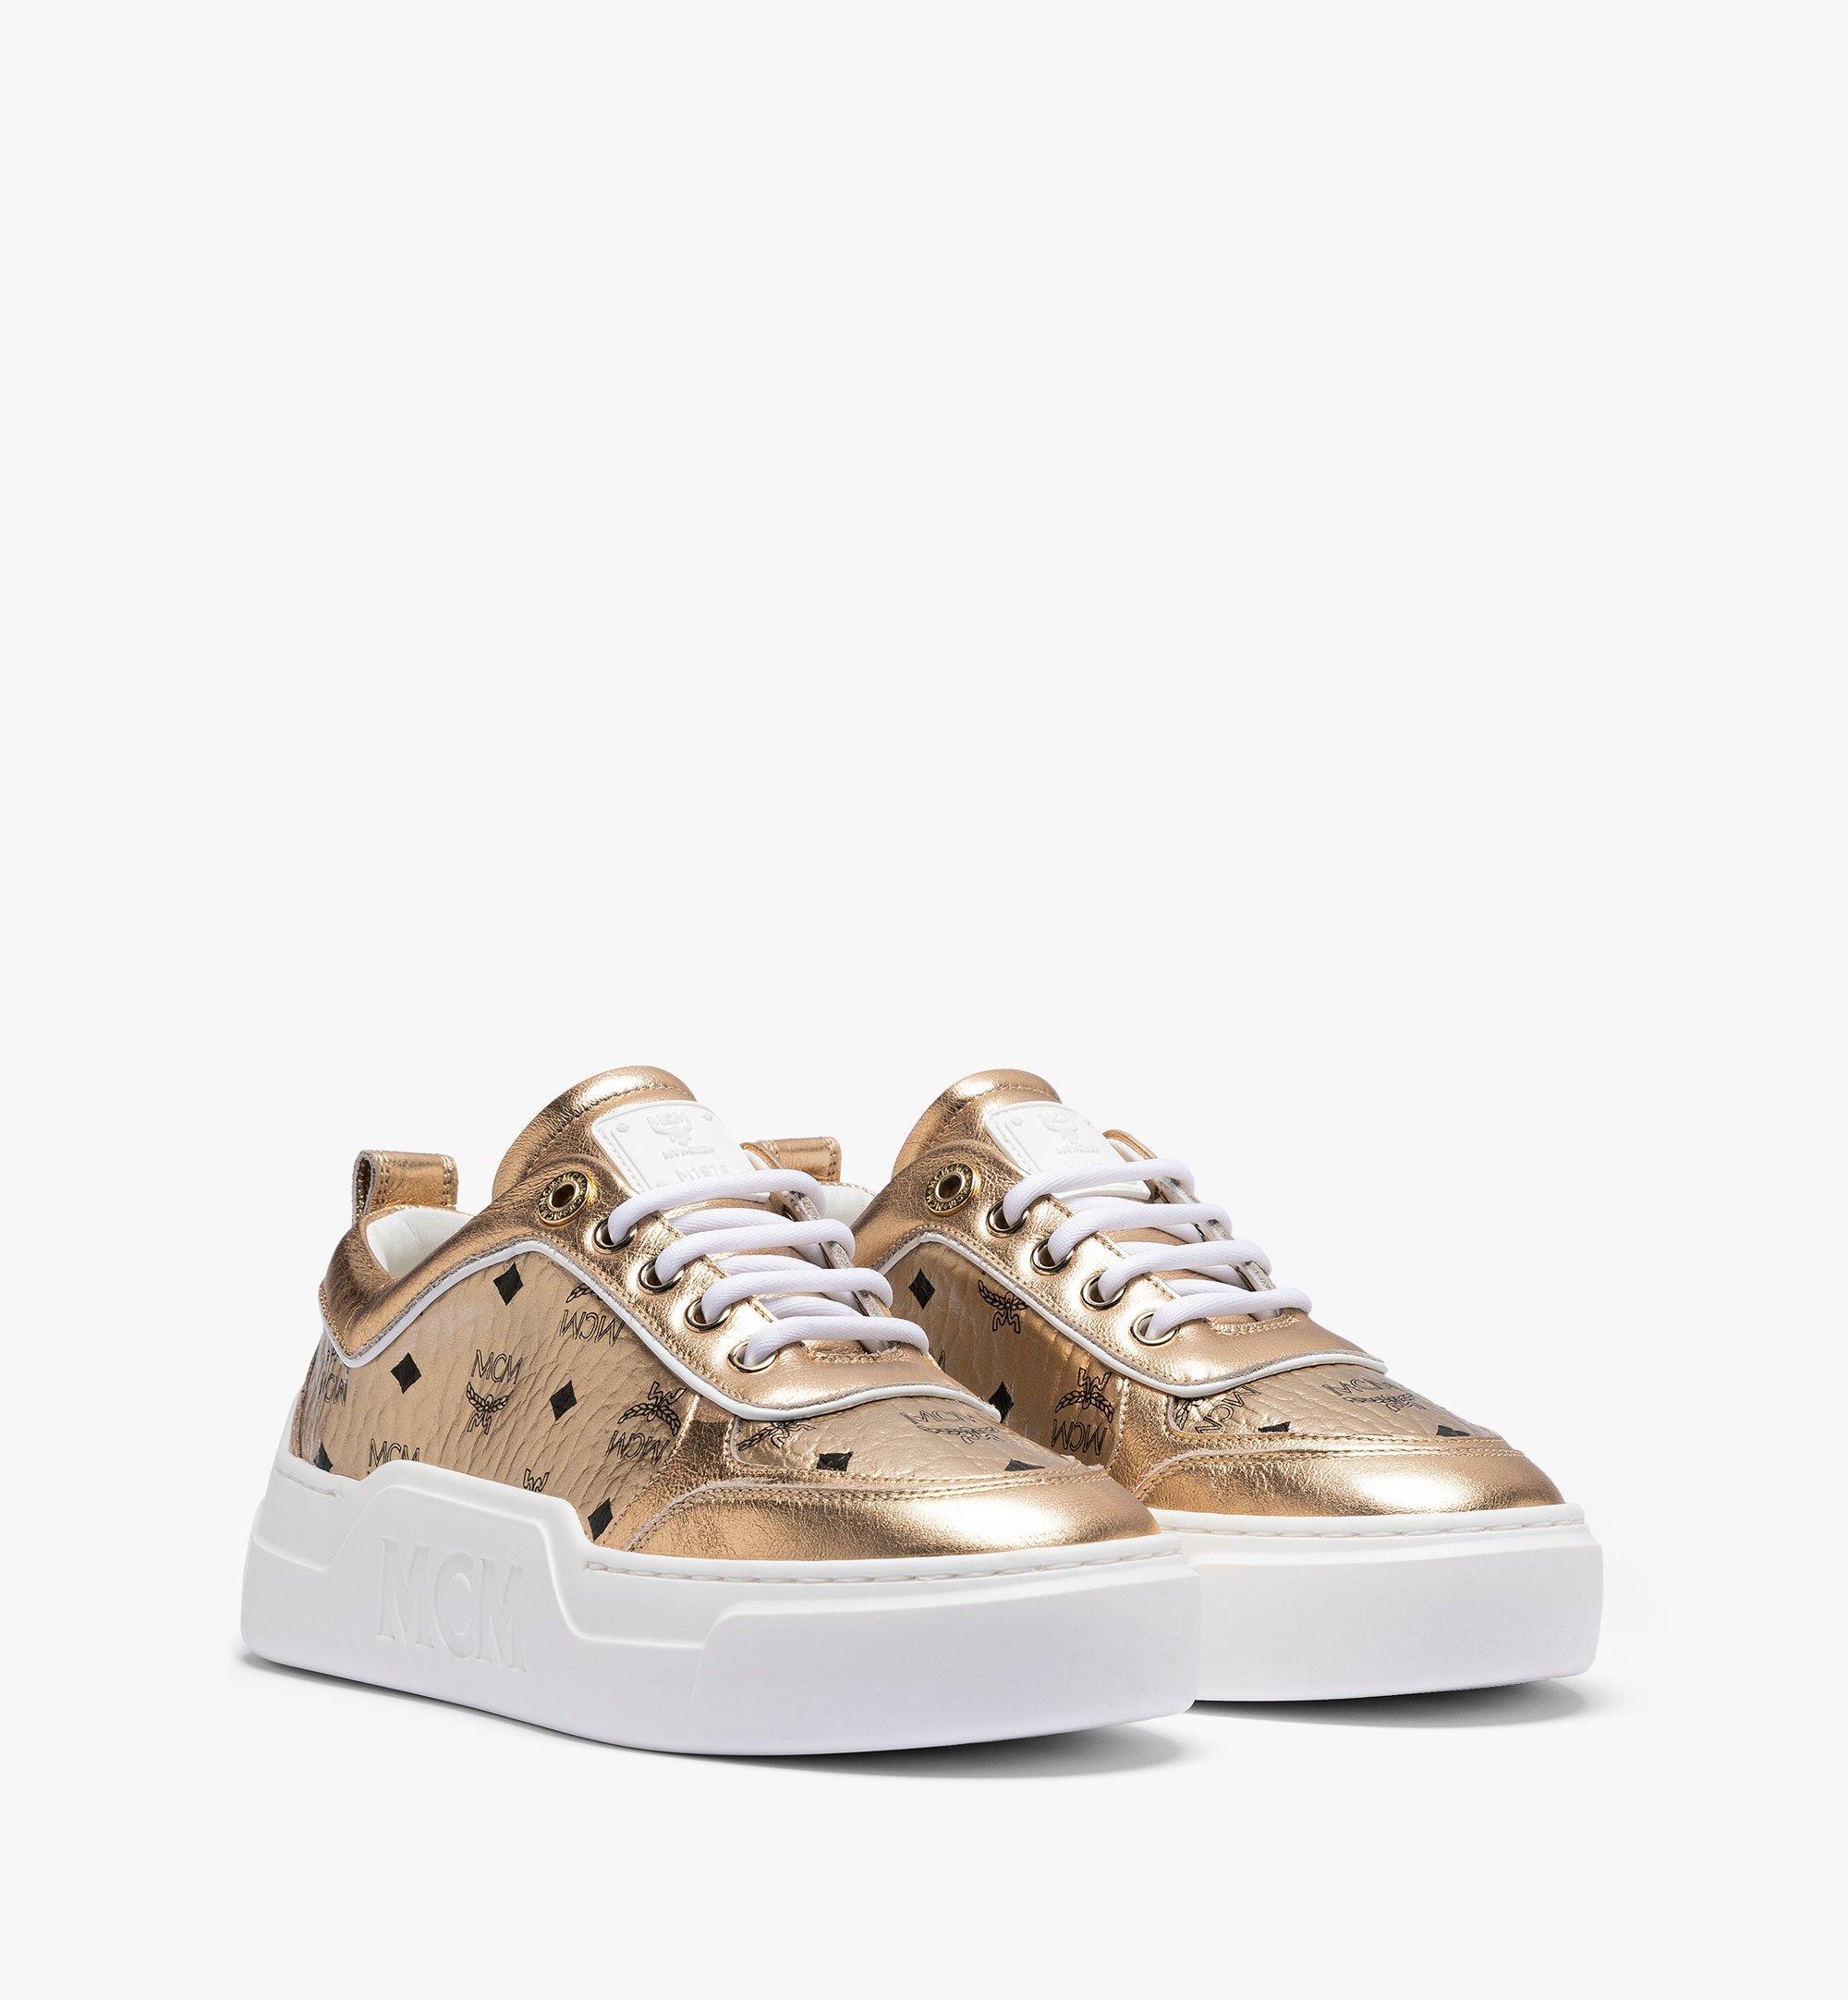 MCM Women's Skyward Platform Sneakers in Visetos Gold MESAAMM19T1035 Alternate View 1